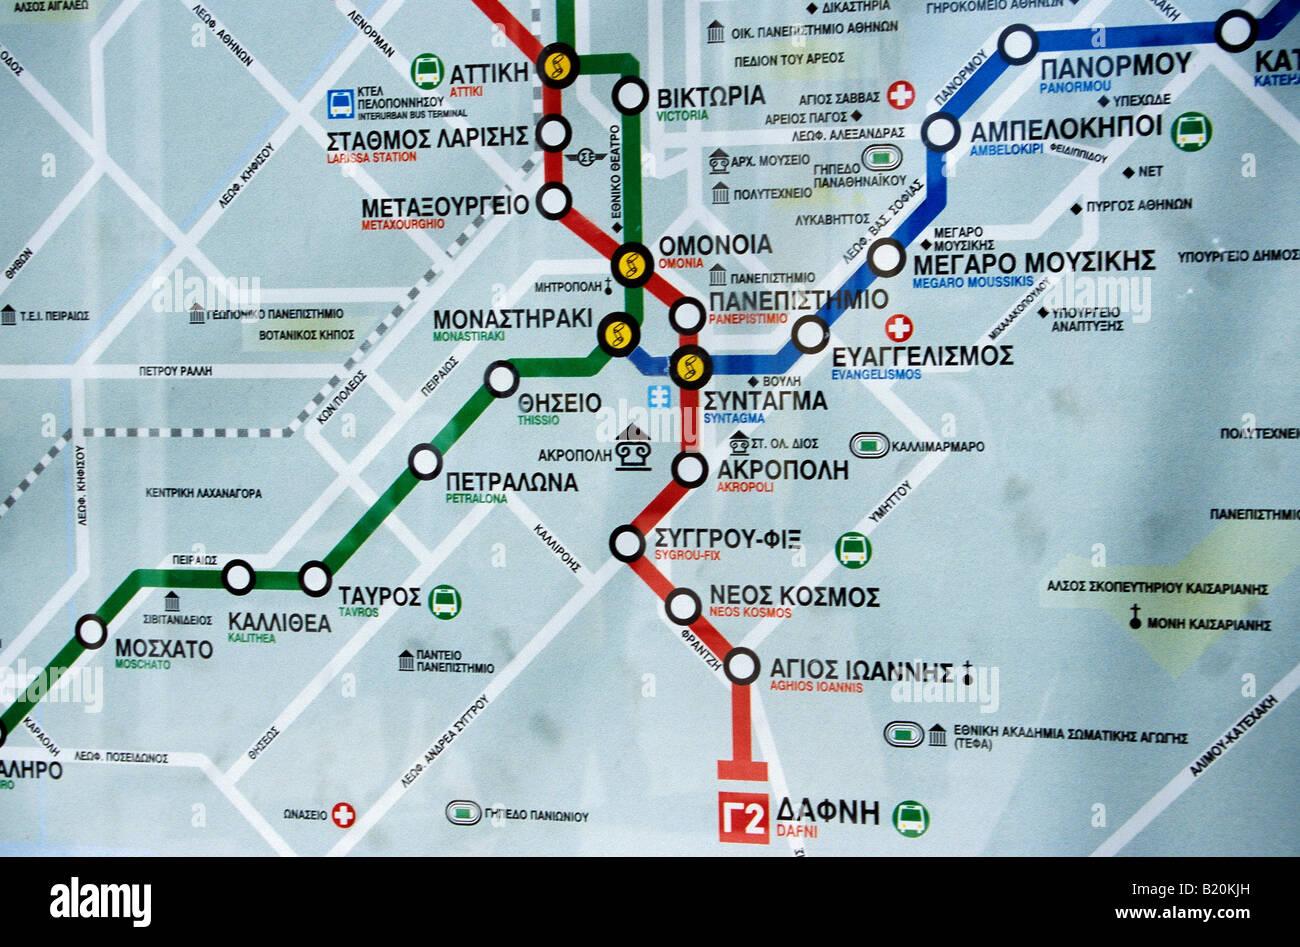 Subway Map Athens.Dual Language Metro Map Athens Greece Stock Photo 18455097 Alamy